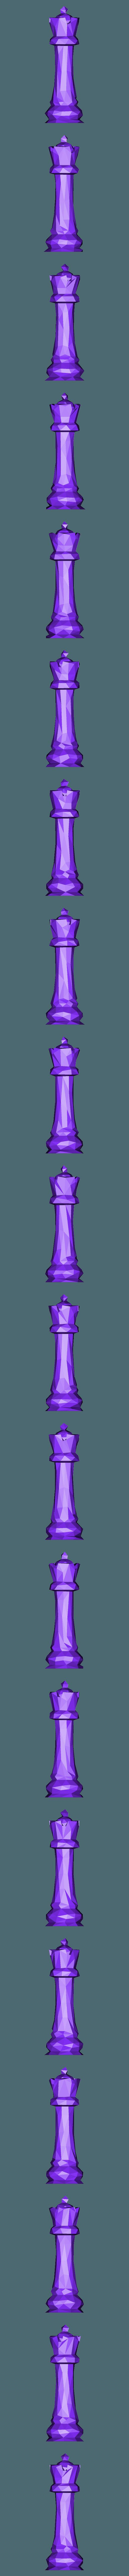 Queen.obj Download free OBJ file Chess Set LowPoly  • Model to 3D print, MarProZ_3D